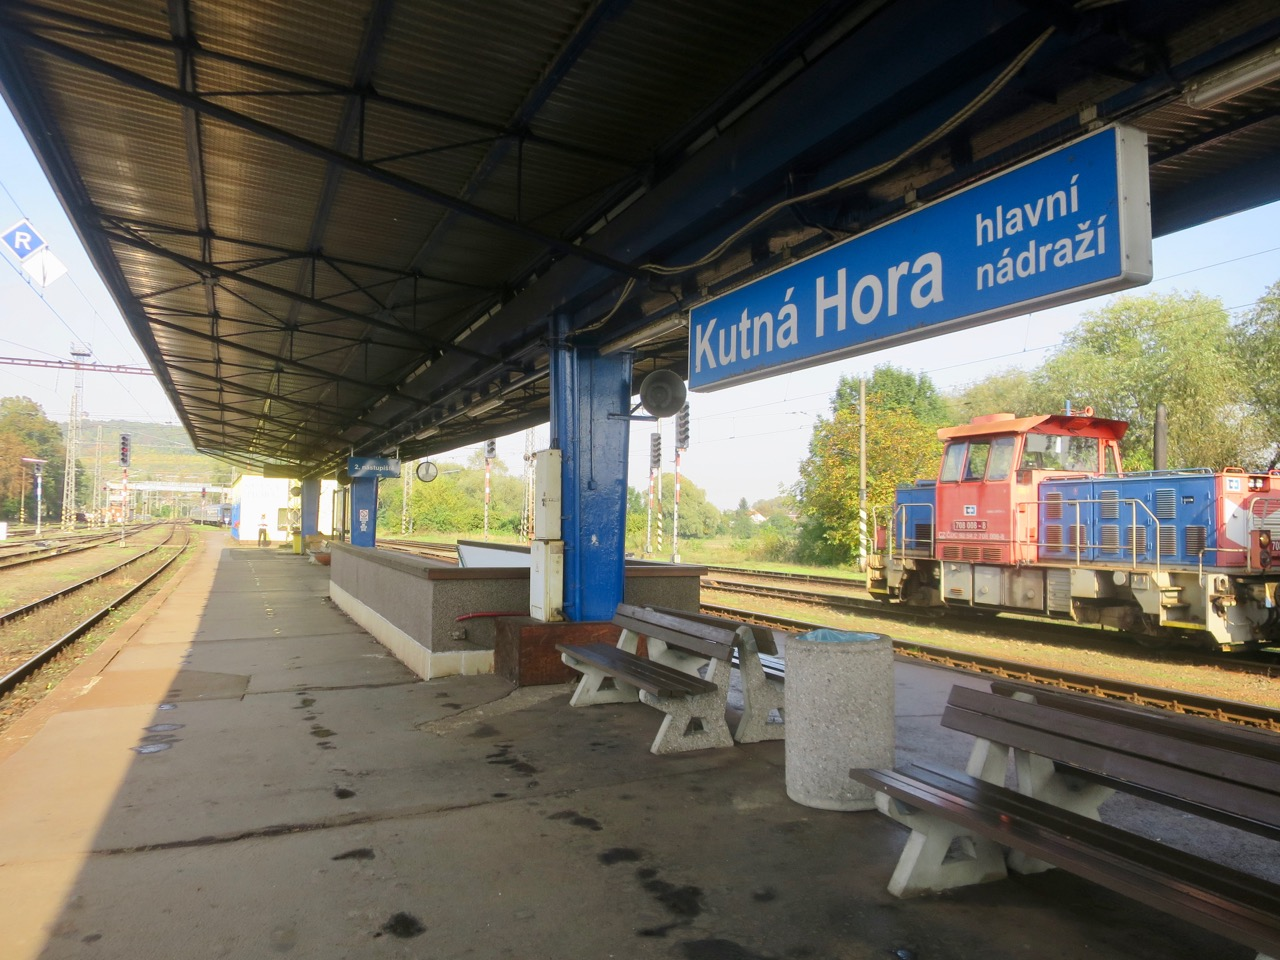 Kutna Hora 1 04